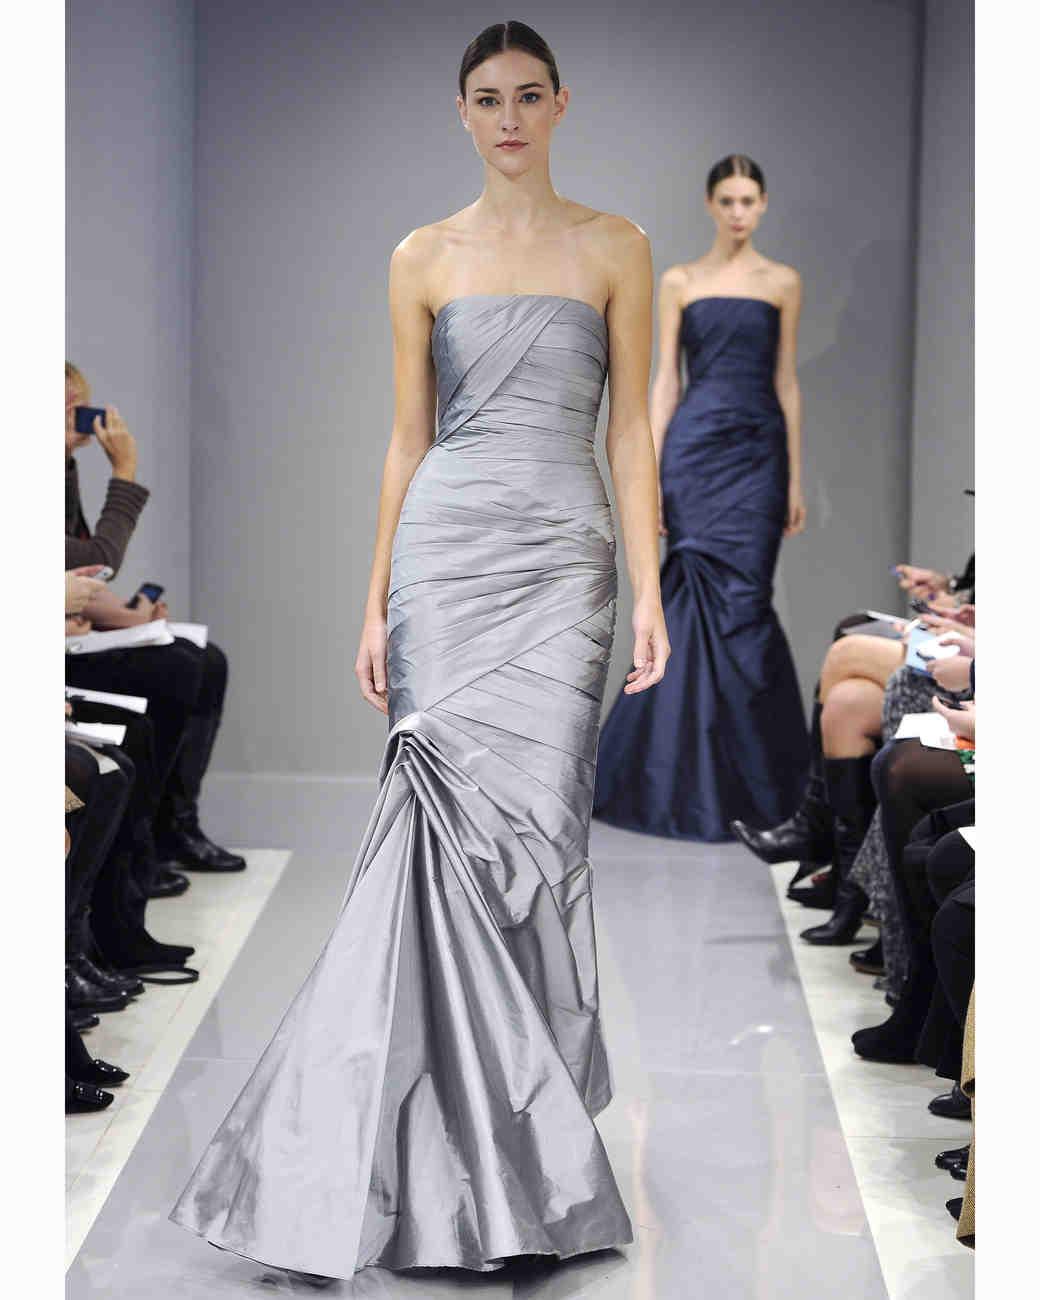 monique-lhuillier-bridesmaids-fall2013-wd109515-001.jpg